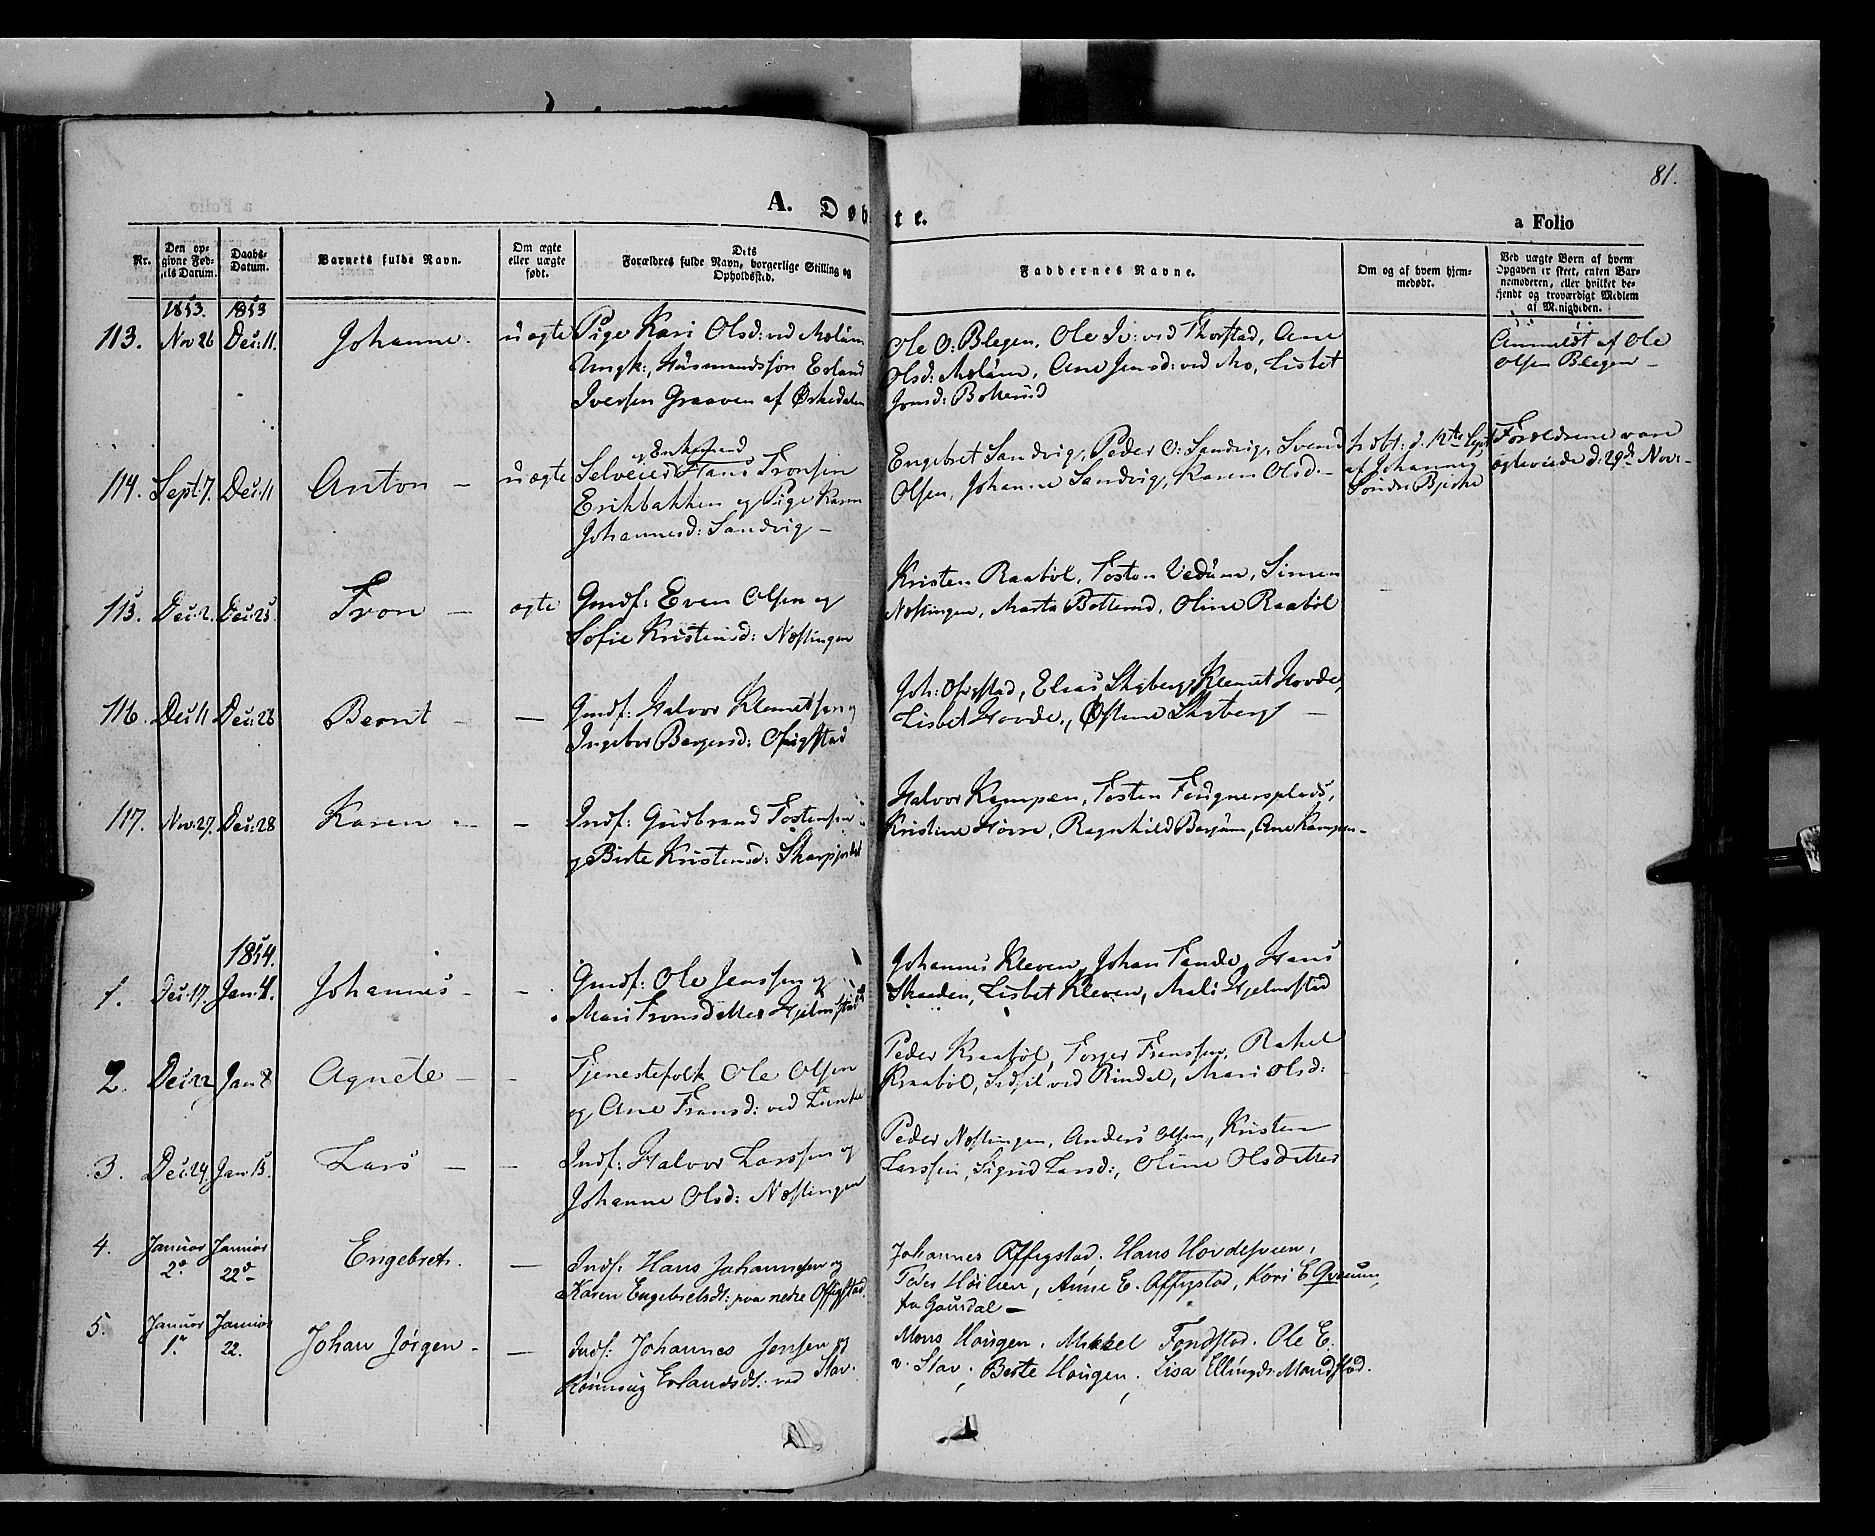 SAH, Øyer prestekontor, Ministerialbok nr. 5, 1842-1857, s. 81